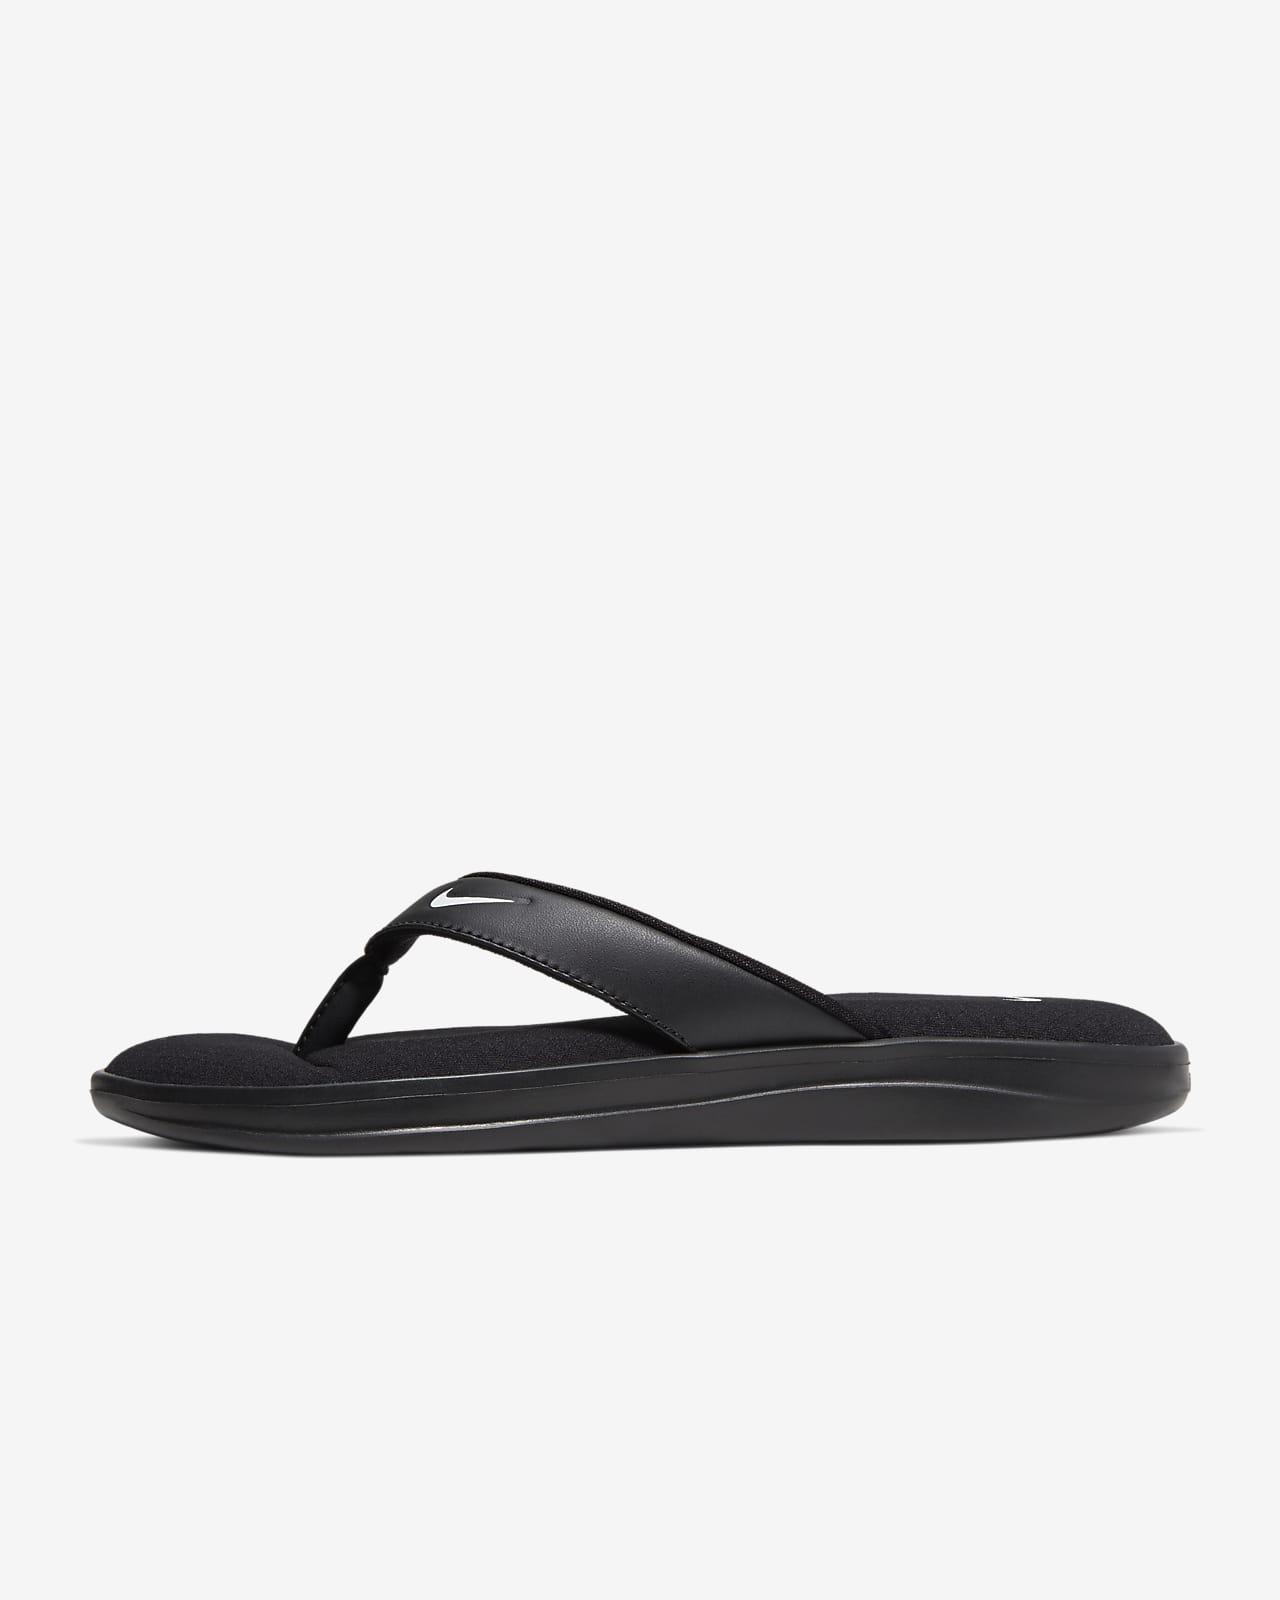 Nike Ultra Comfort 3 Women's Thong Sandal